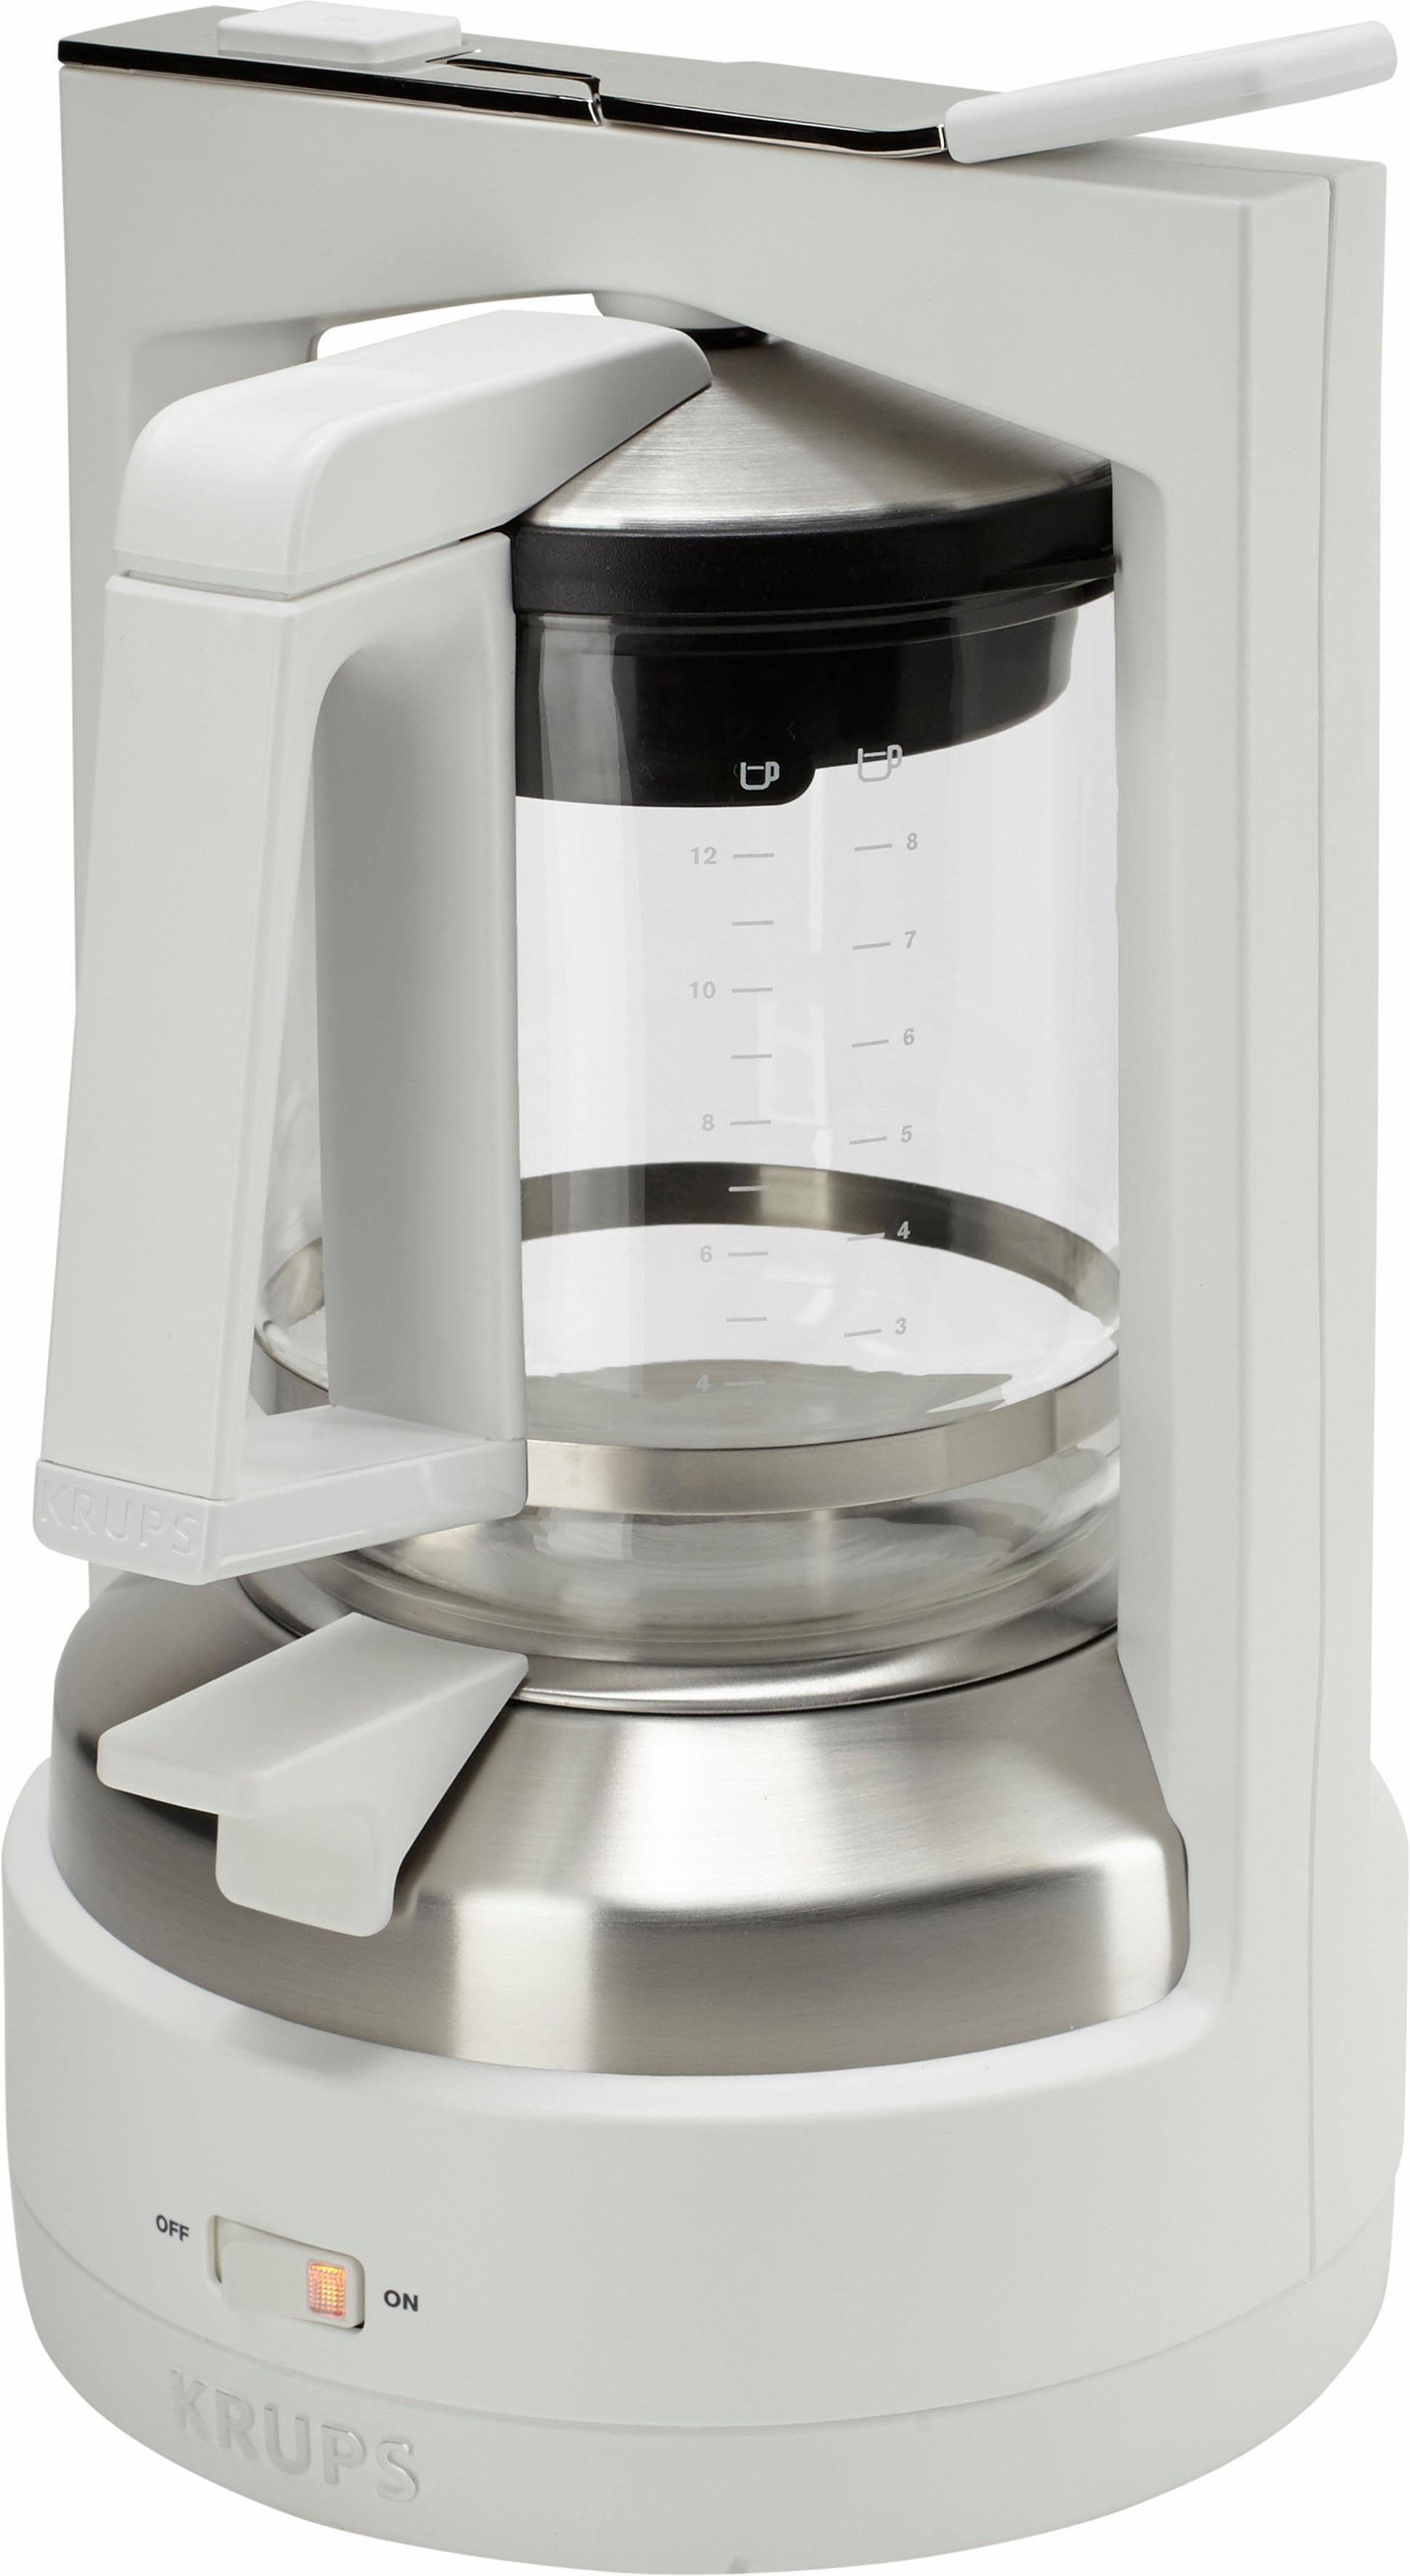 Krups Druckbrüh-Kaffeemaschine KM4682 T 8.2, 1l Kaffeekanne, Permanentfilter